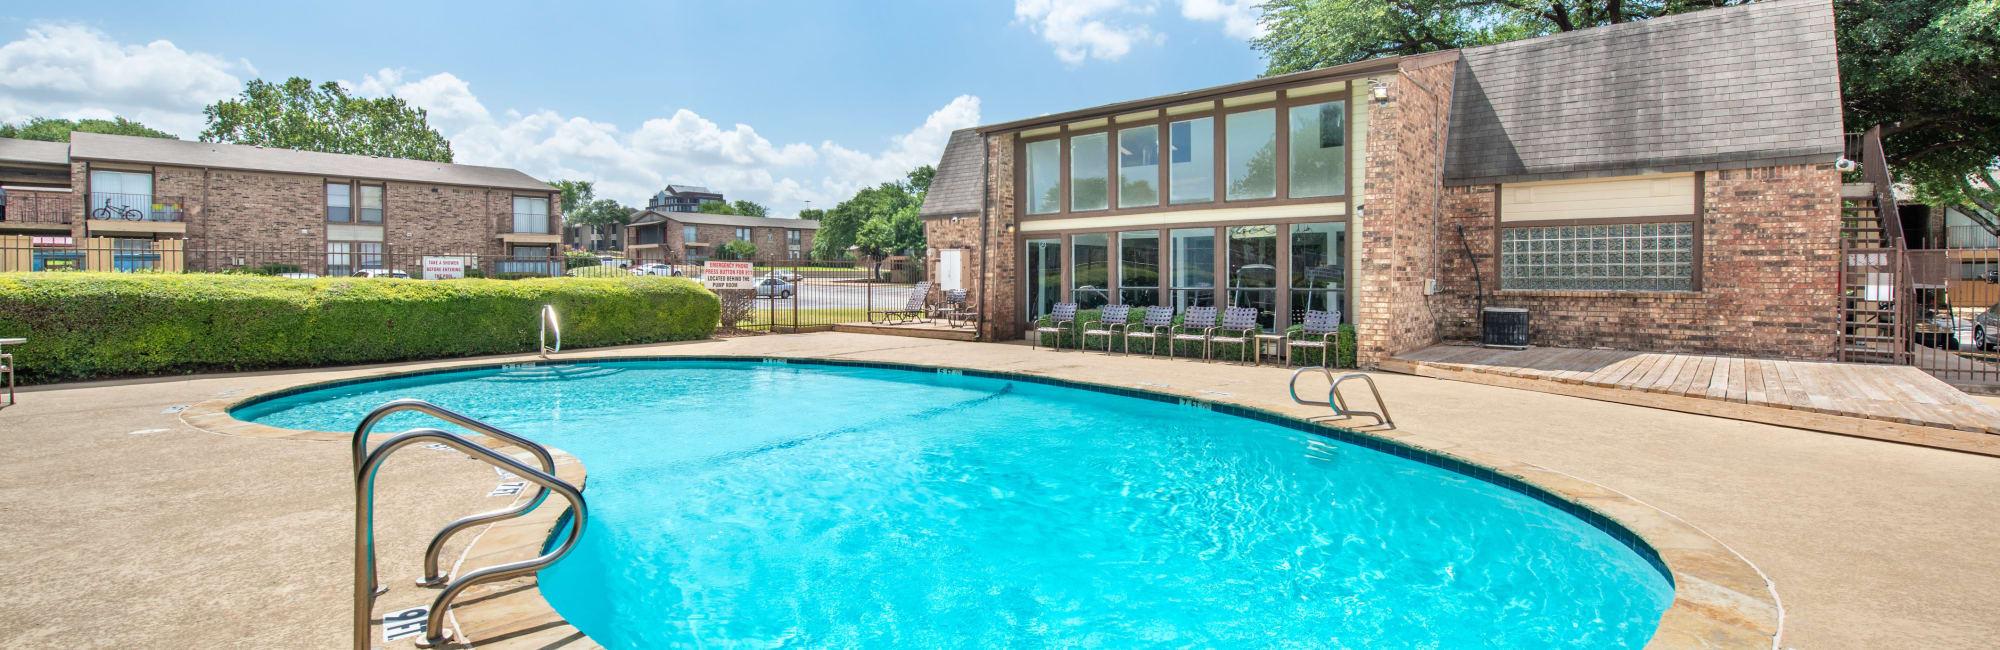 Apartments at 8500 Harwood Apartment Homes in North Richland Hills, Texas